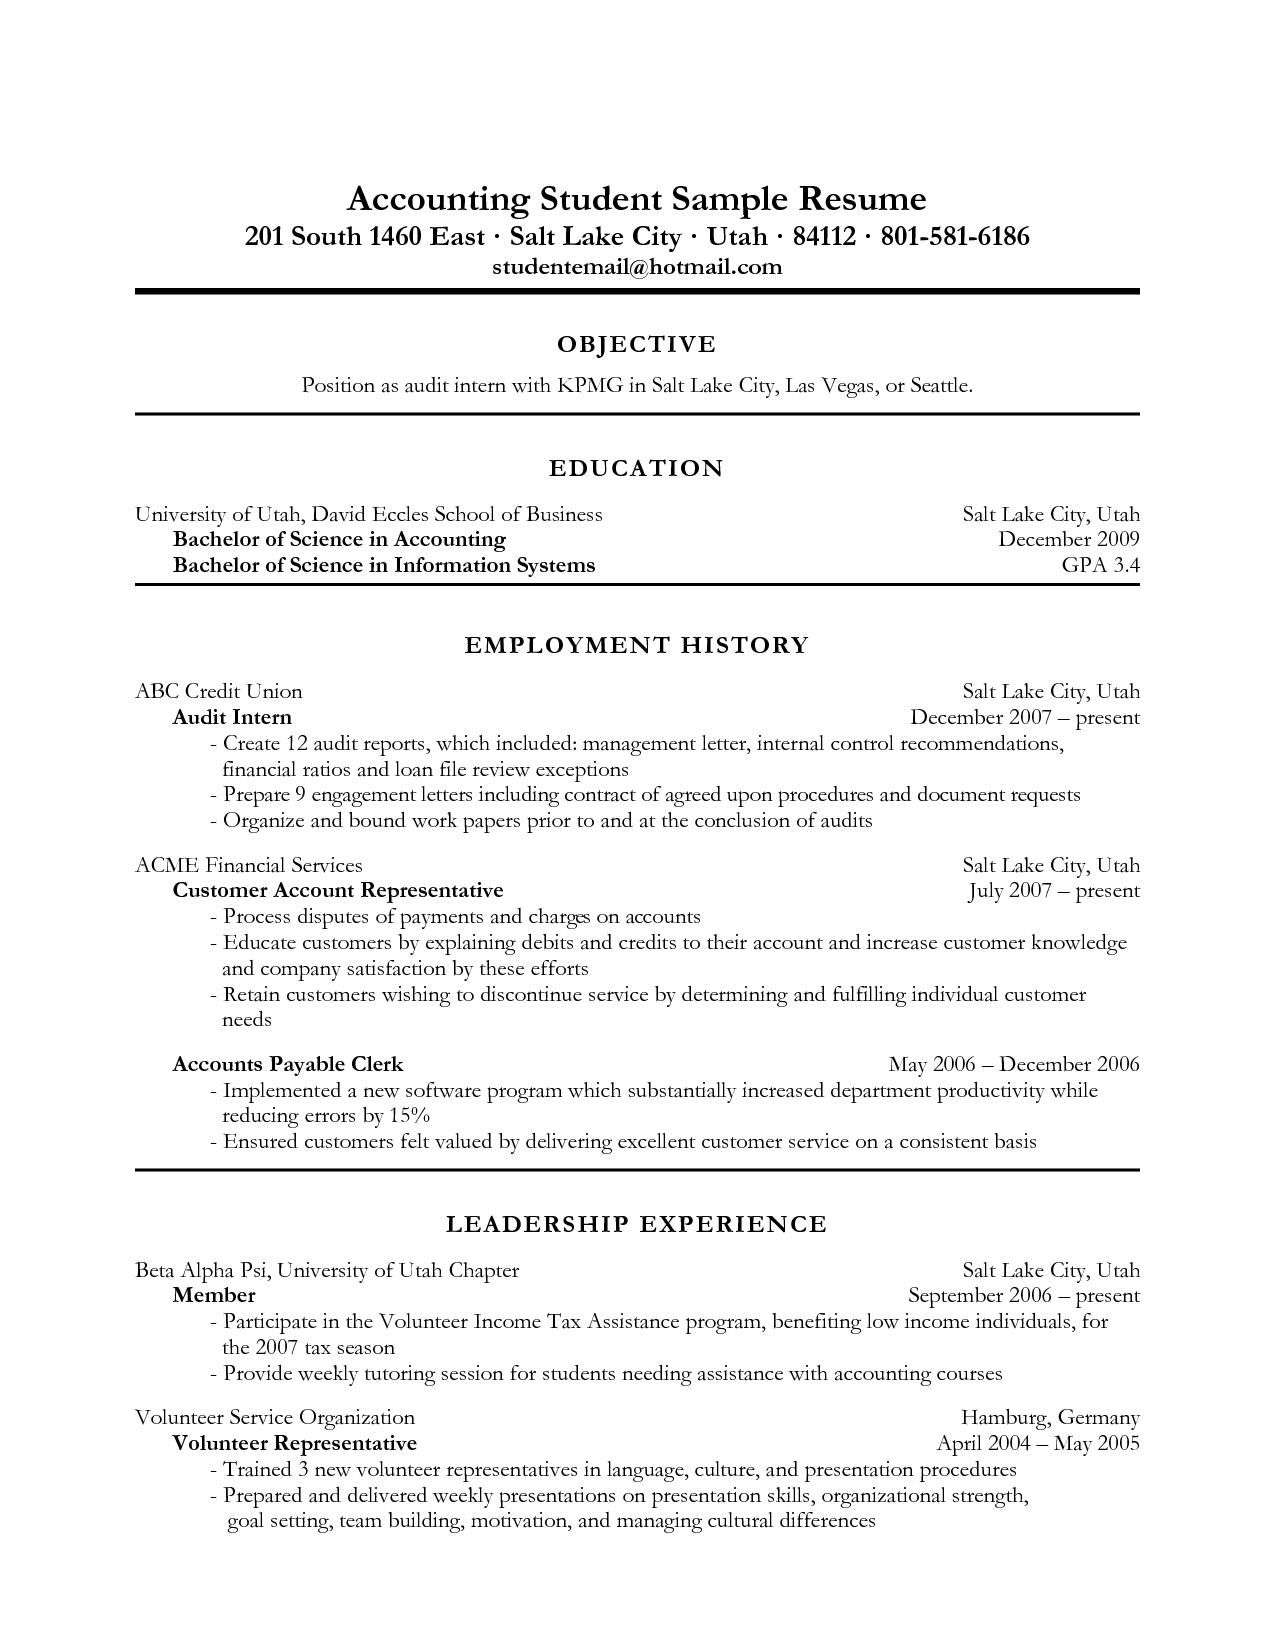 Resume Objective Statement Samples